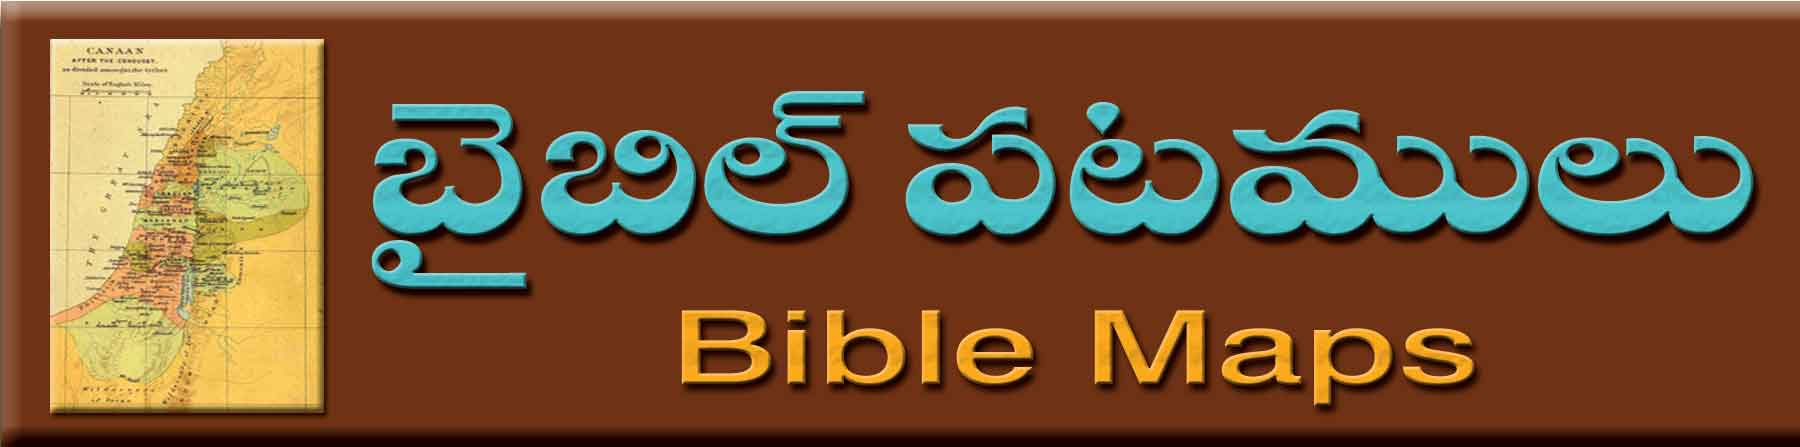 Bible Literature Ministry - Telugu Bible